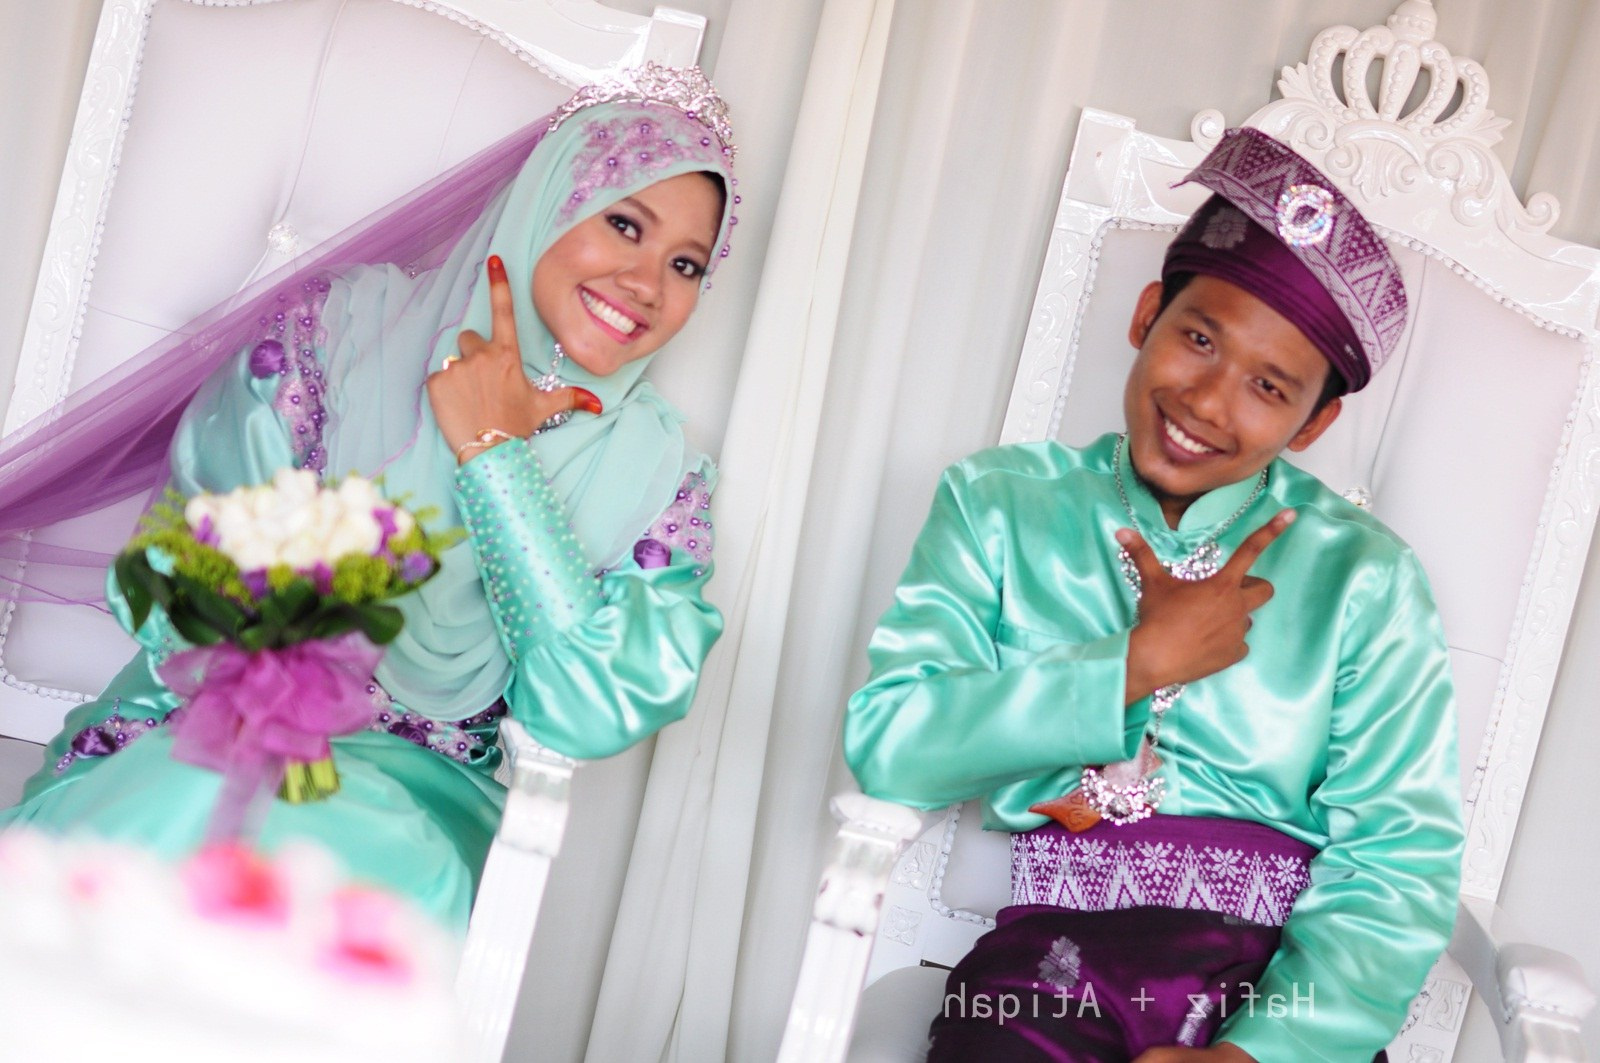 Design Gaun Pengantin Muslimah Warna Hijau Y7du 36 Baju Pengantin songket Mint Green Modis Dan Cantik